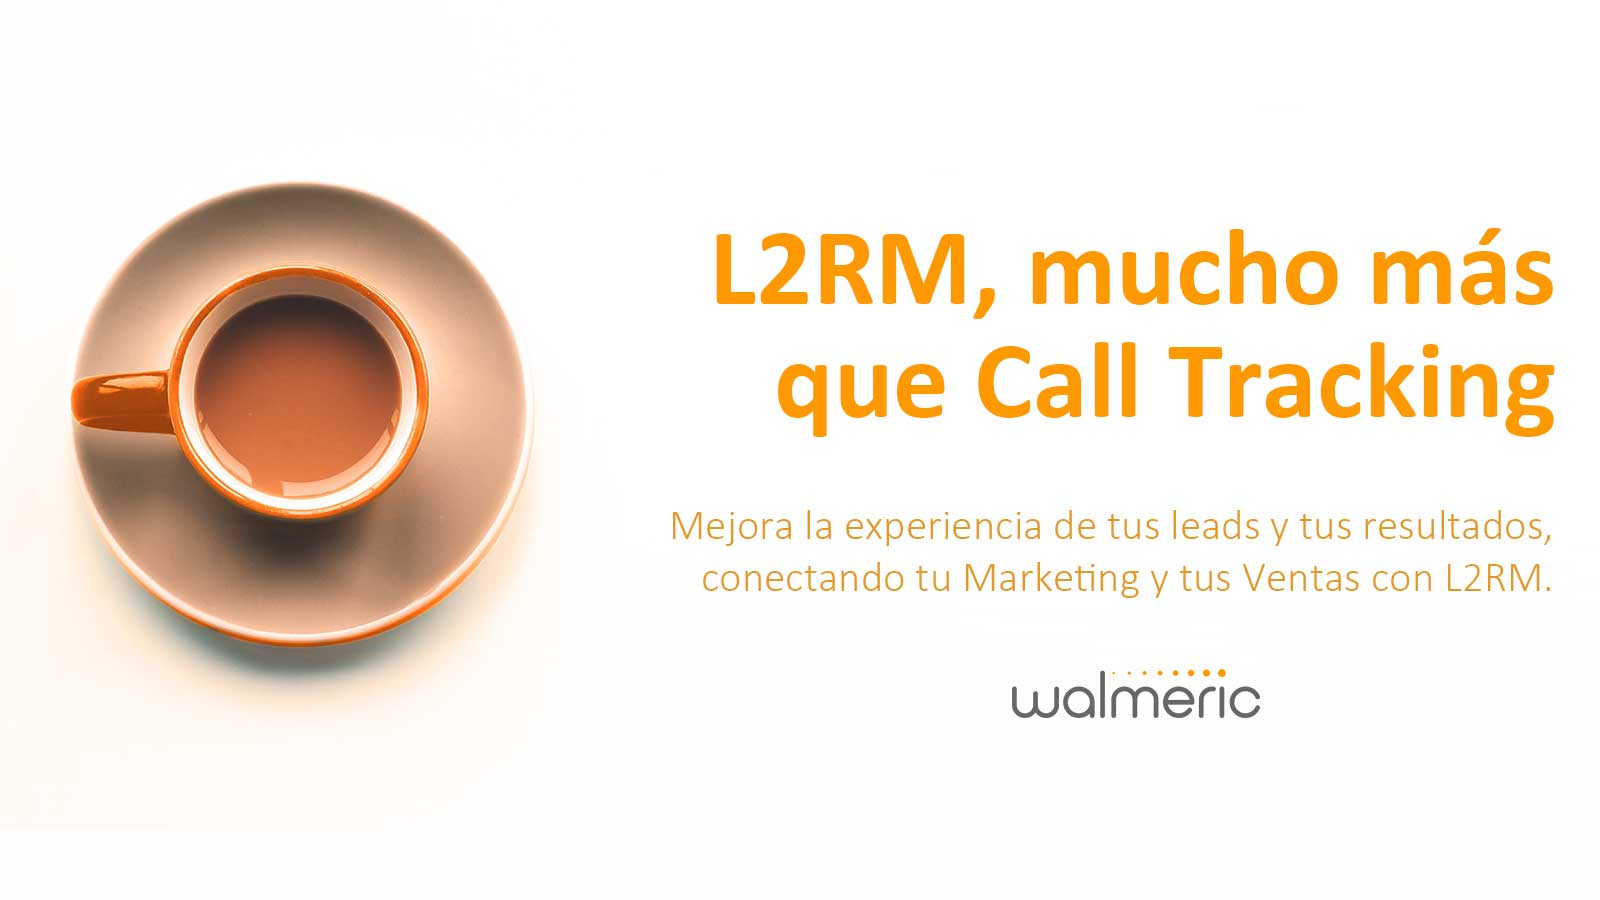 L2RM-Call-Tracking-Webinar